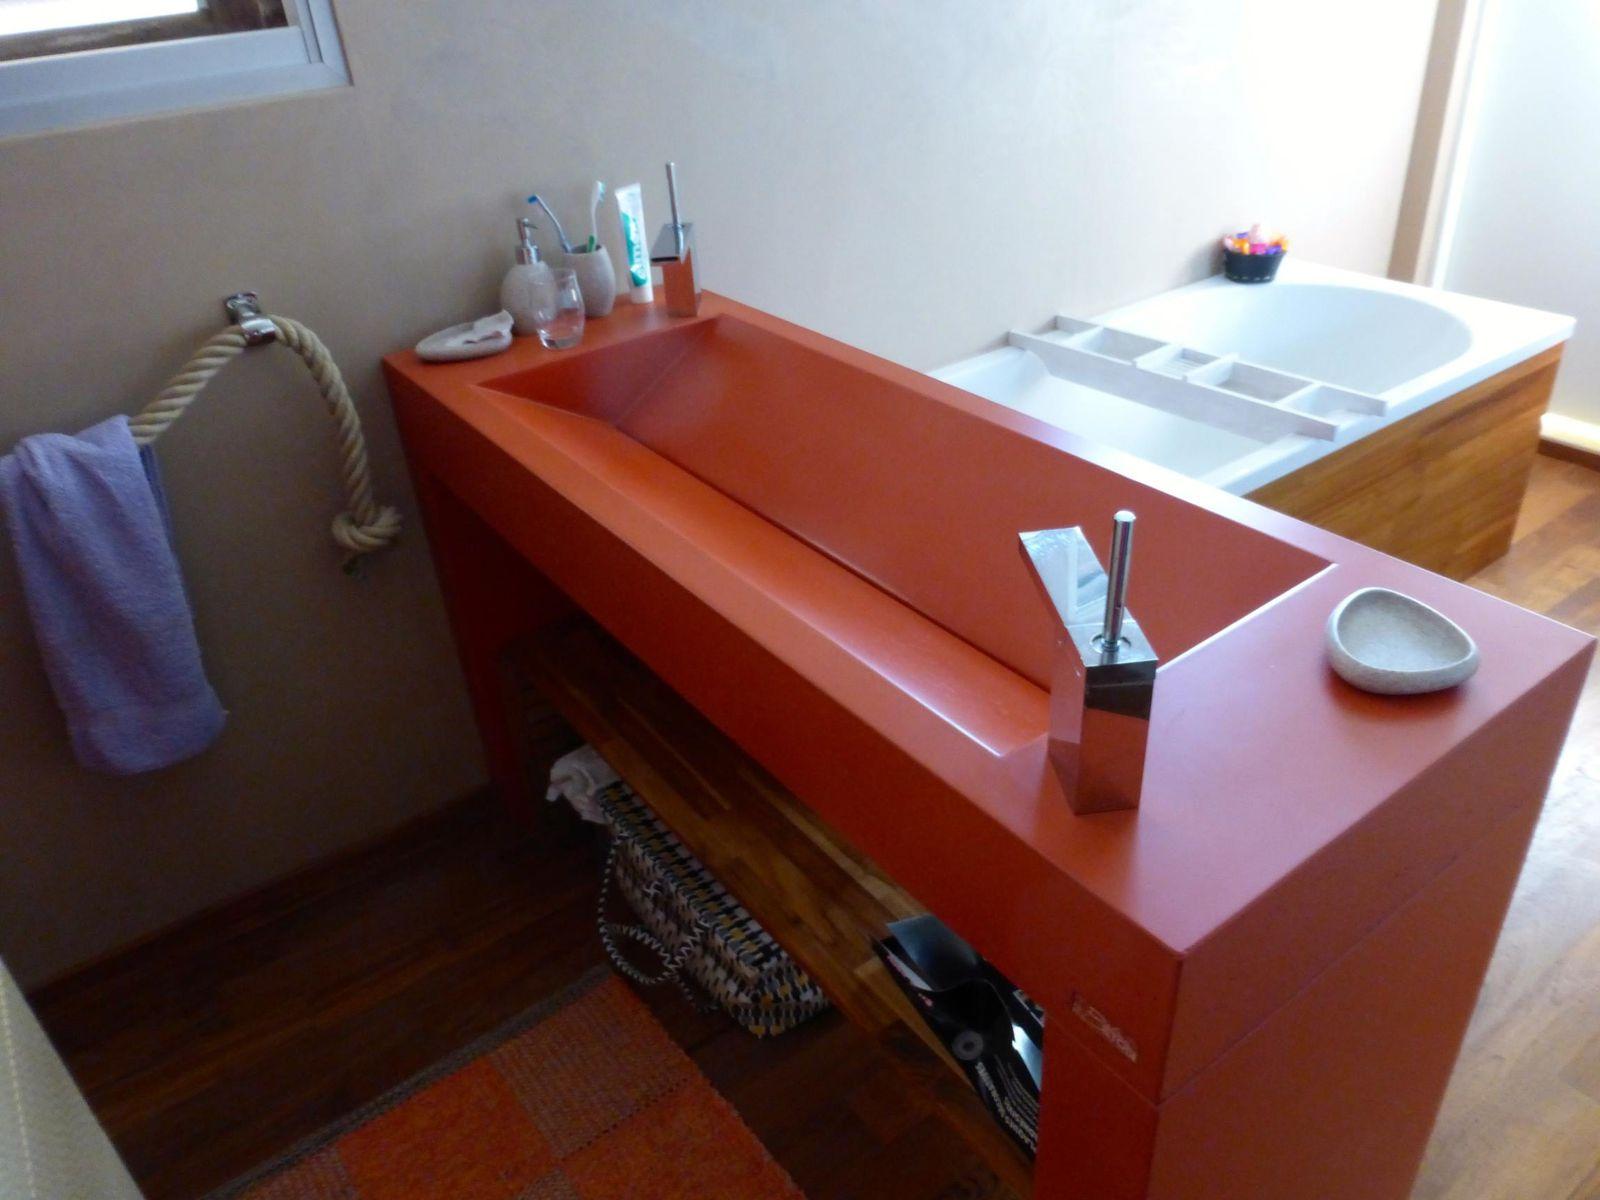 Plan vasque lavoir double pente balian beton atelier for Vasque sous plan salle de bain